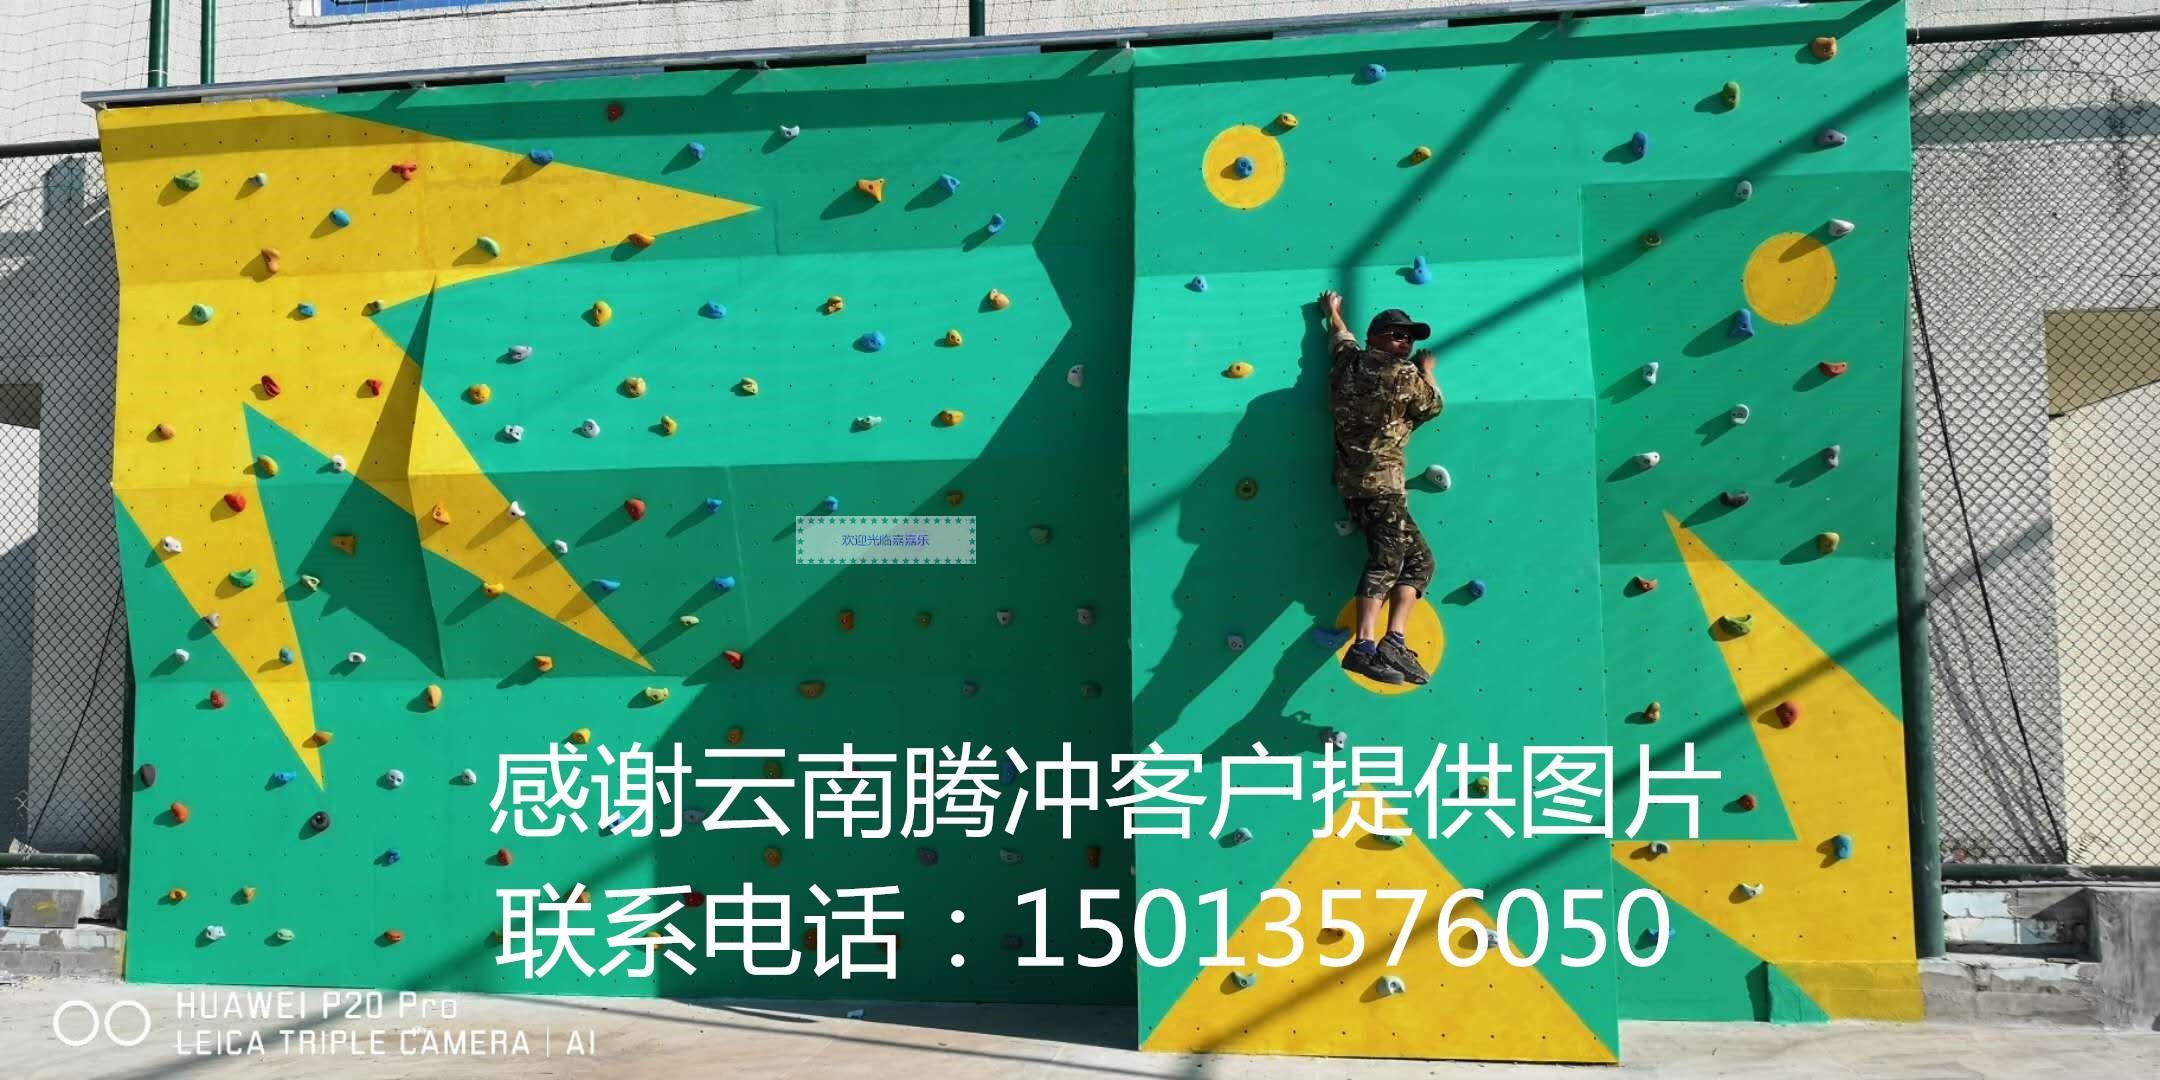 Climbing kindergarten facilities climbing wall outdoor large-scale climbing gym school wall indoor childrens home climbing